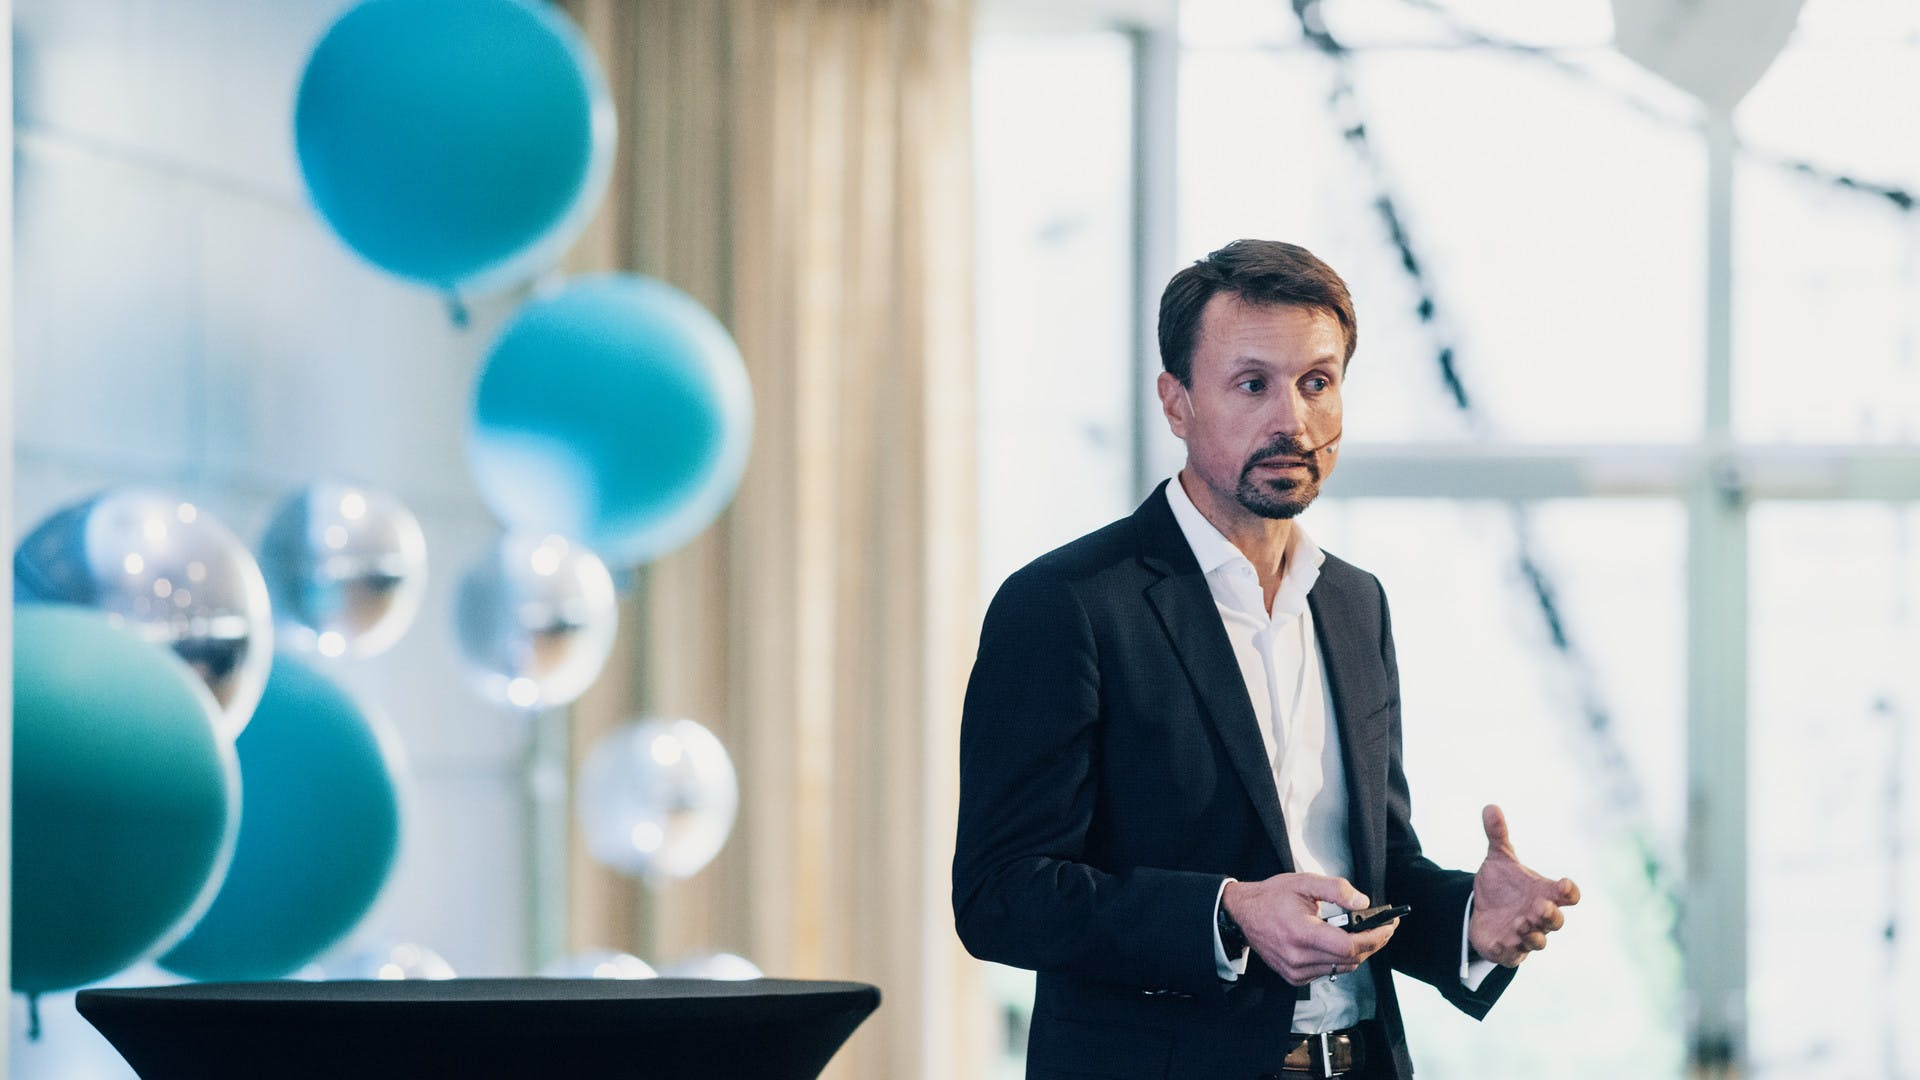 Claes Watndal, CEO of Mentis Cura presenting at Abelia Open 2019